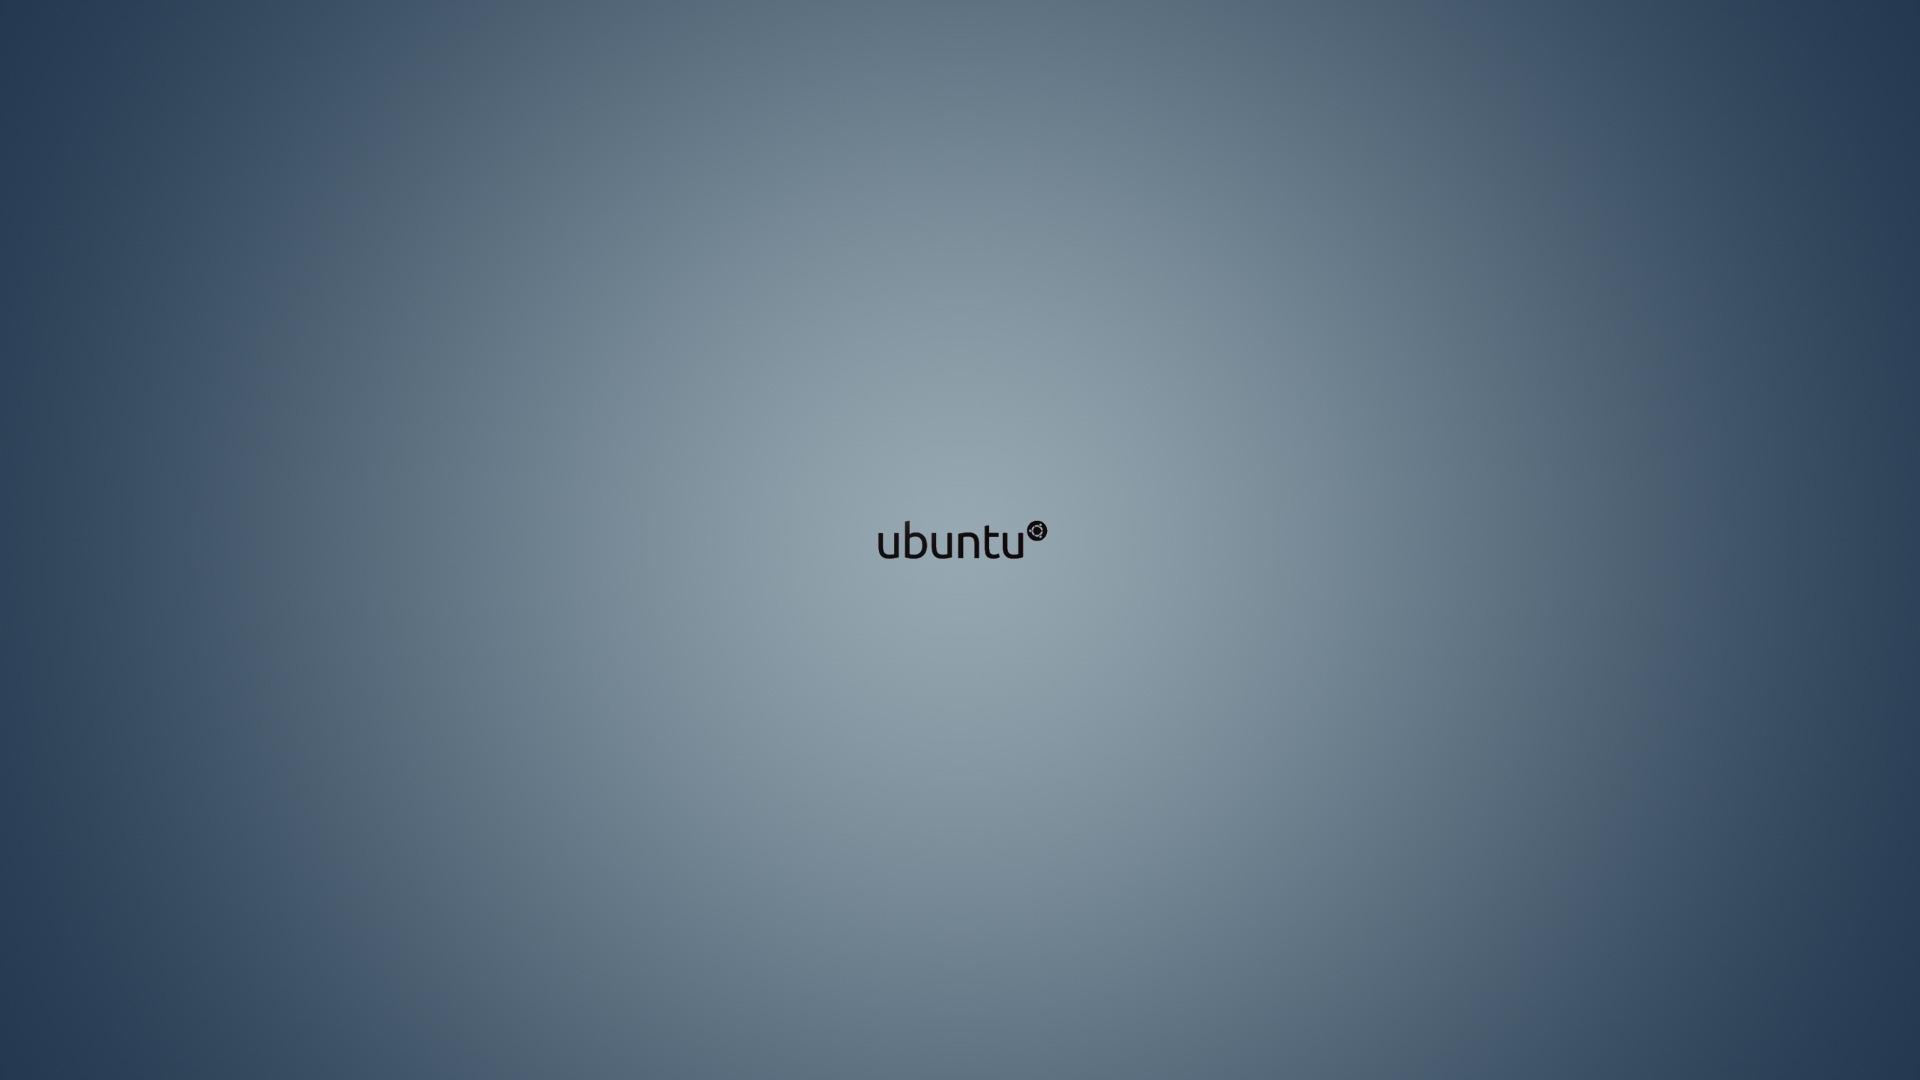 how to get ubuntu to 1920 vm